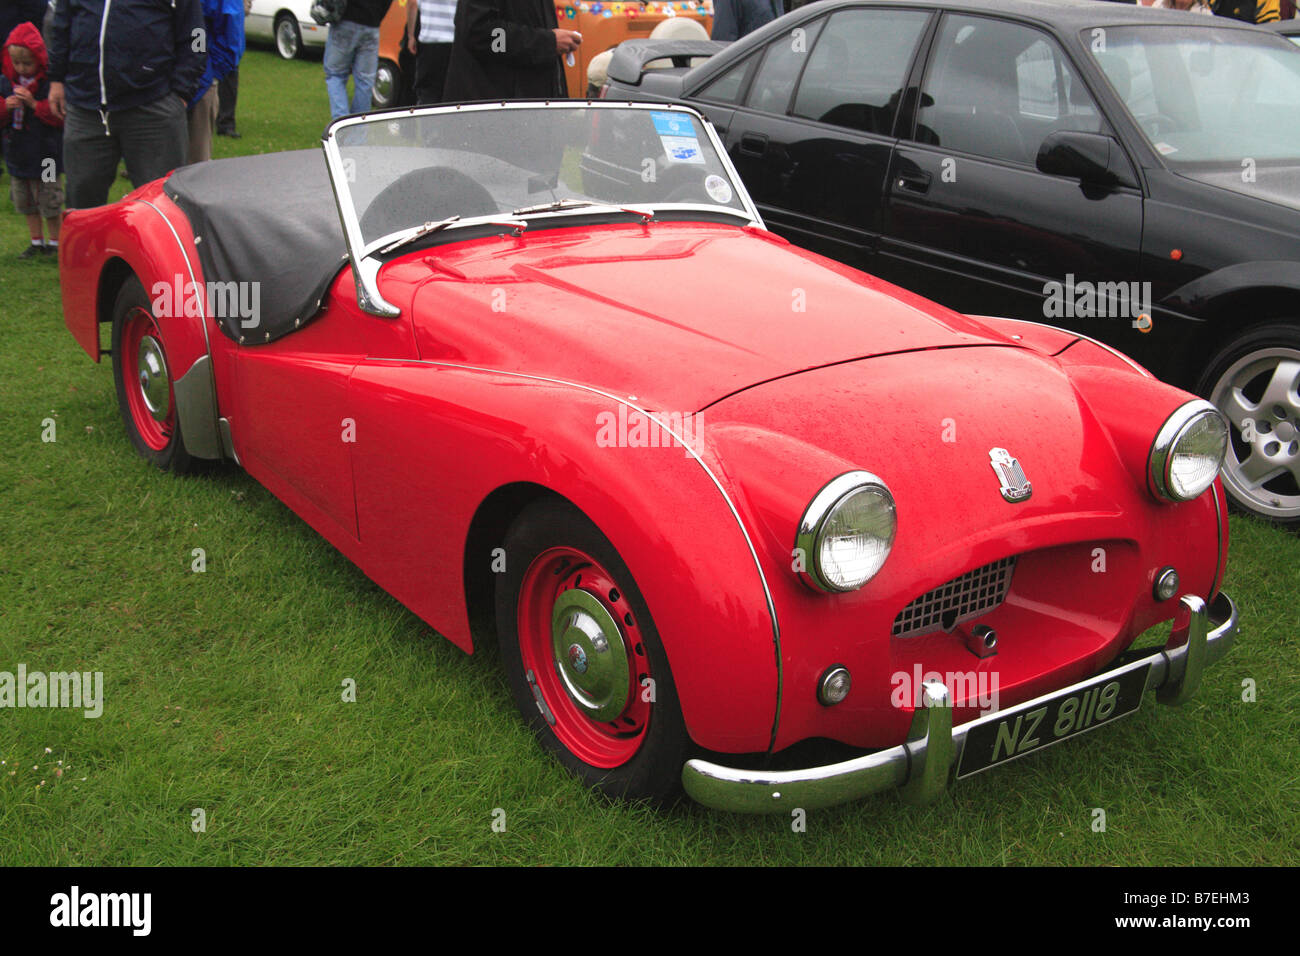 Triumph TR2 rojo coche clásico vehículo motor sport convertable chrome Inglés británico British Imagen De Stock